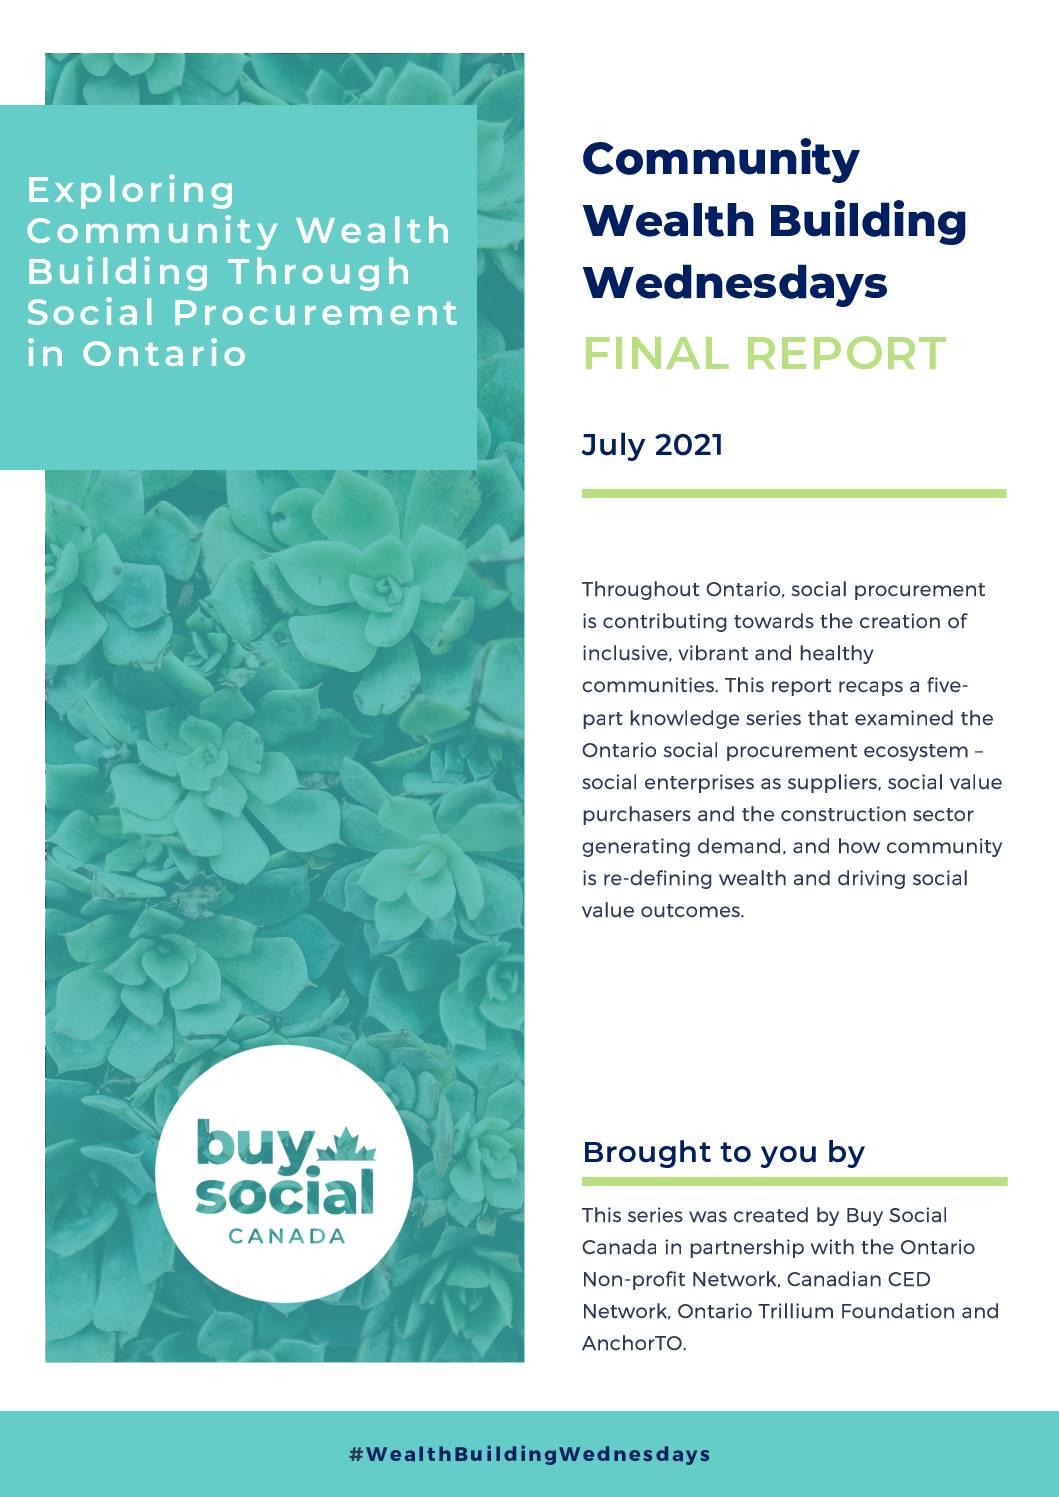 Exploring Community Wealth Building Through Social Procurement in Ontario — Final Report